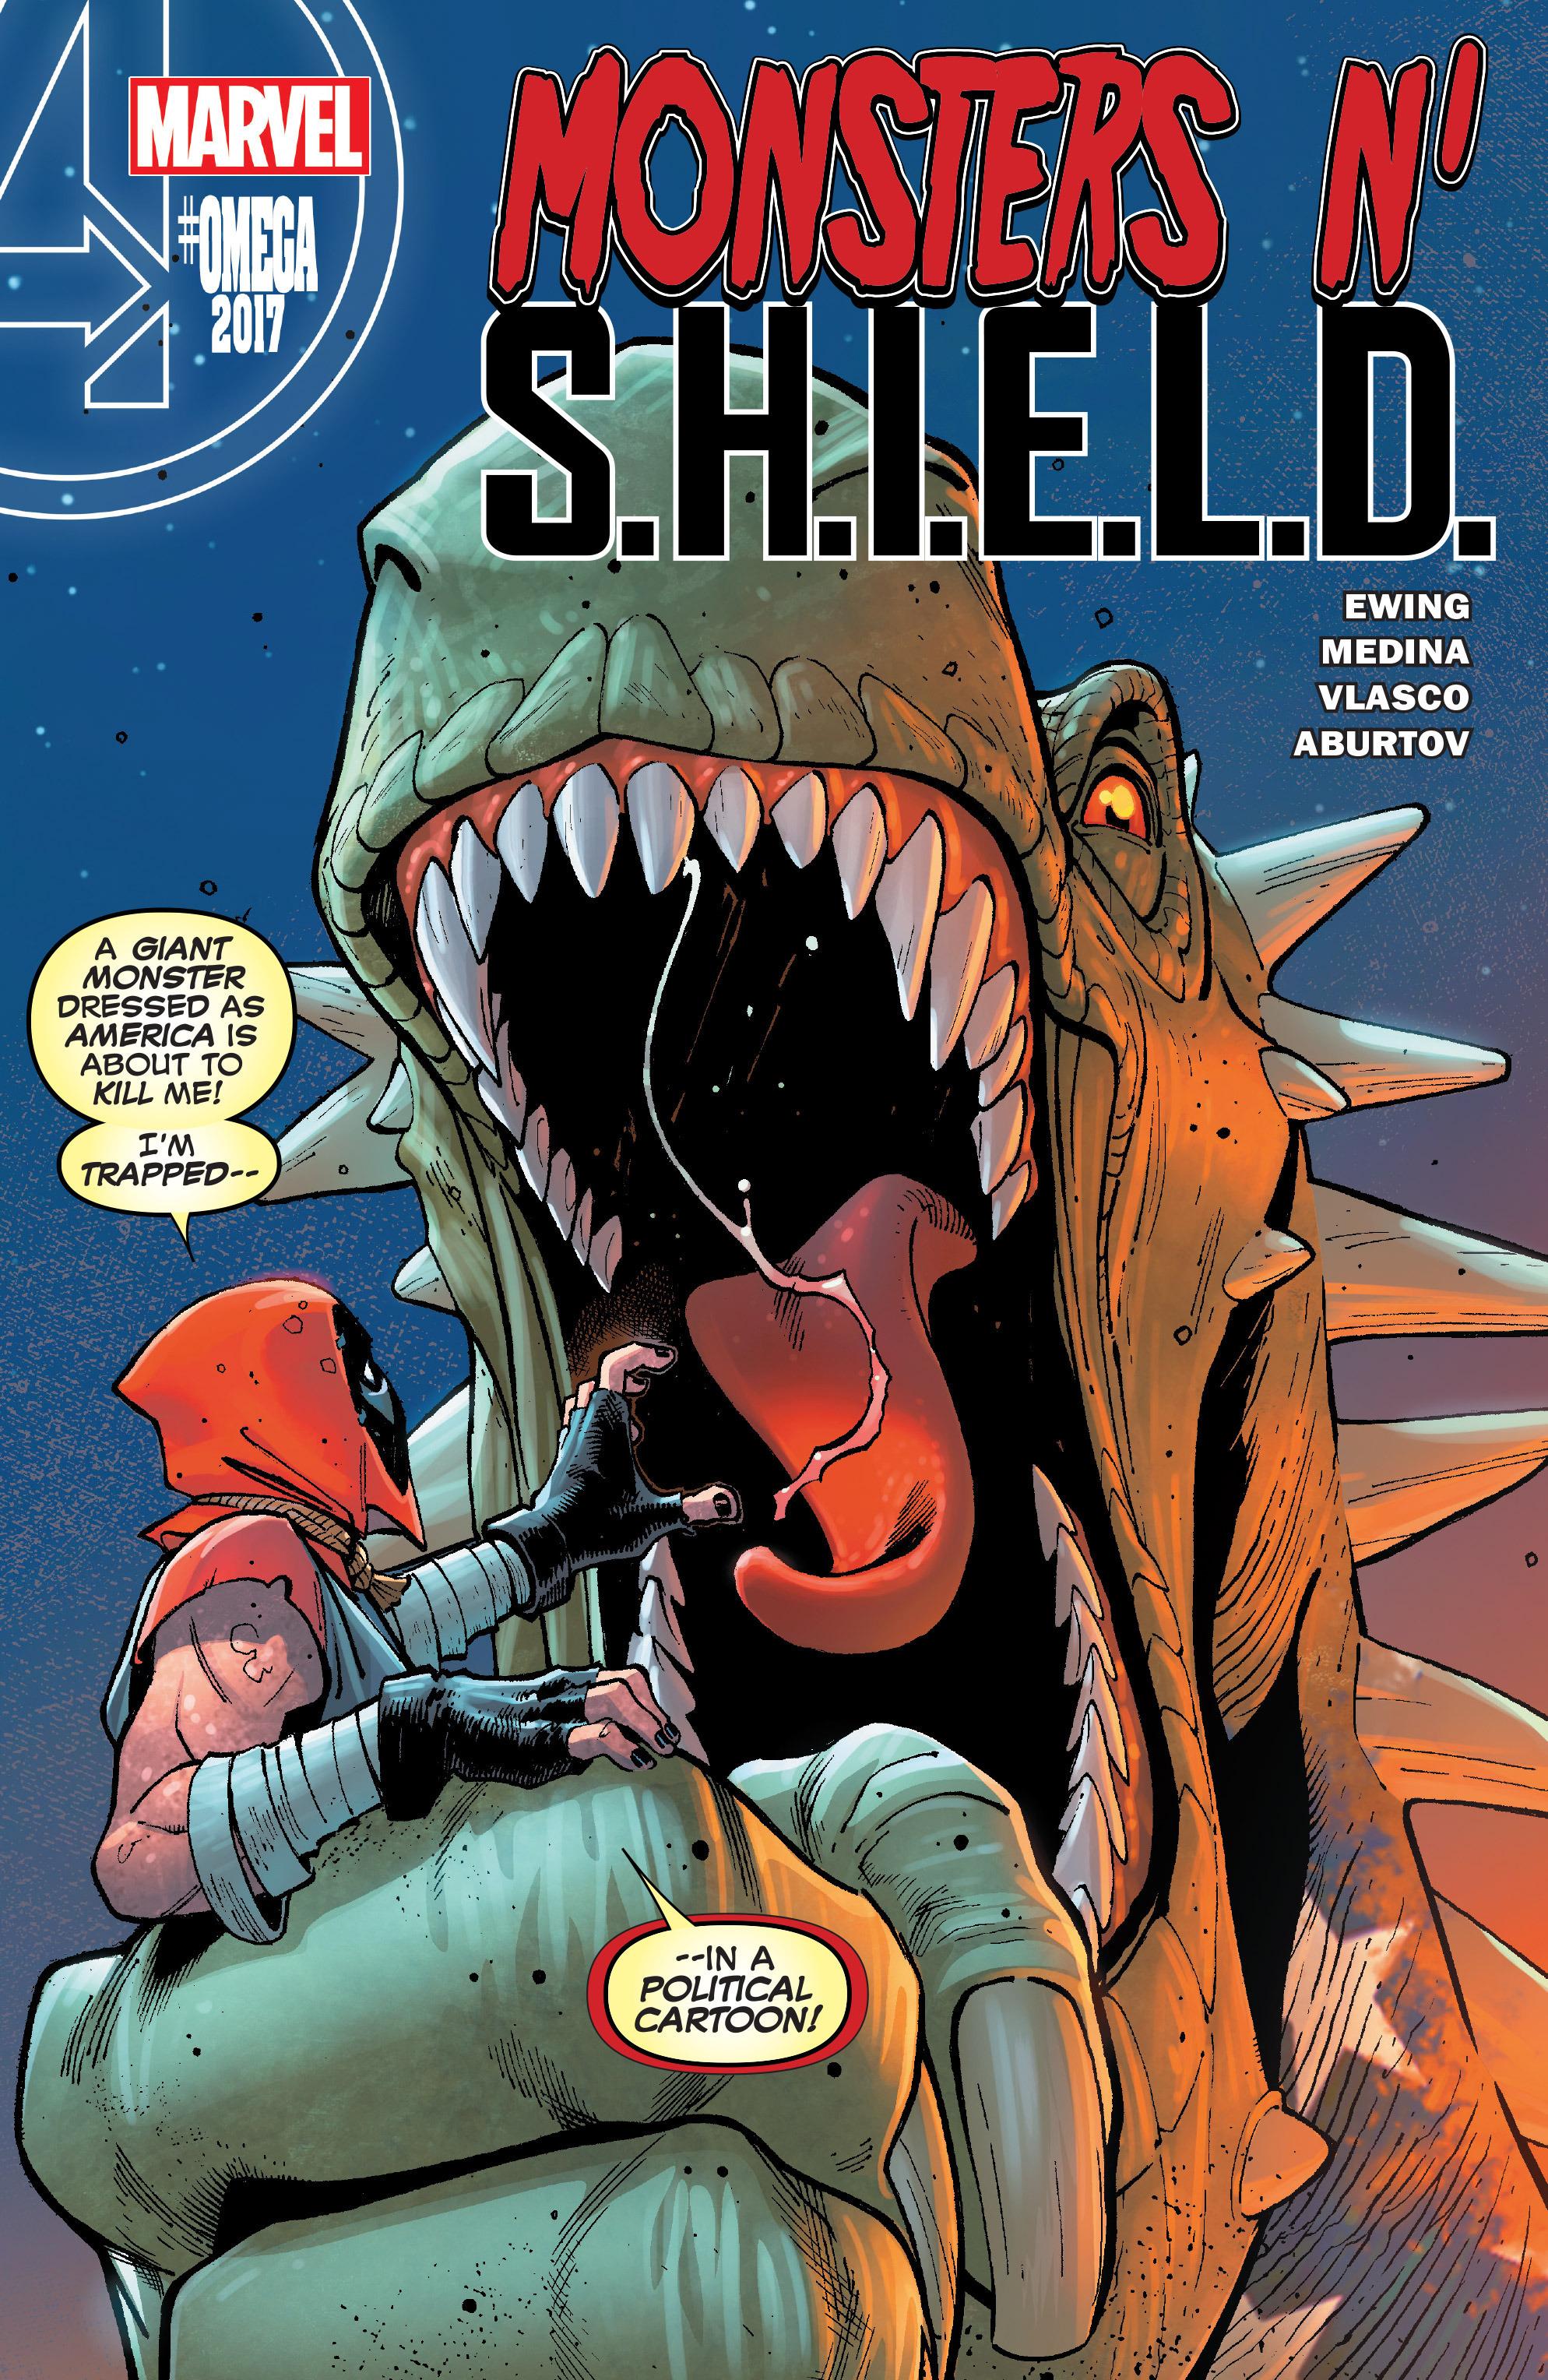 Read online U.S.Avengers comic -  Issue #4 - 18